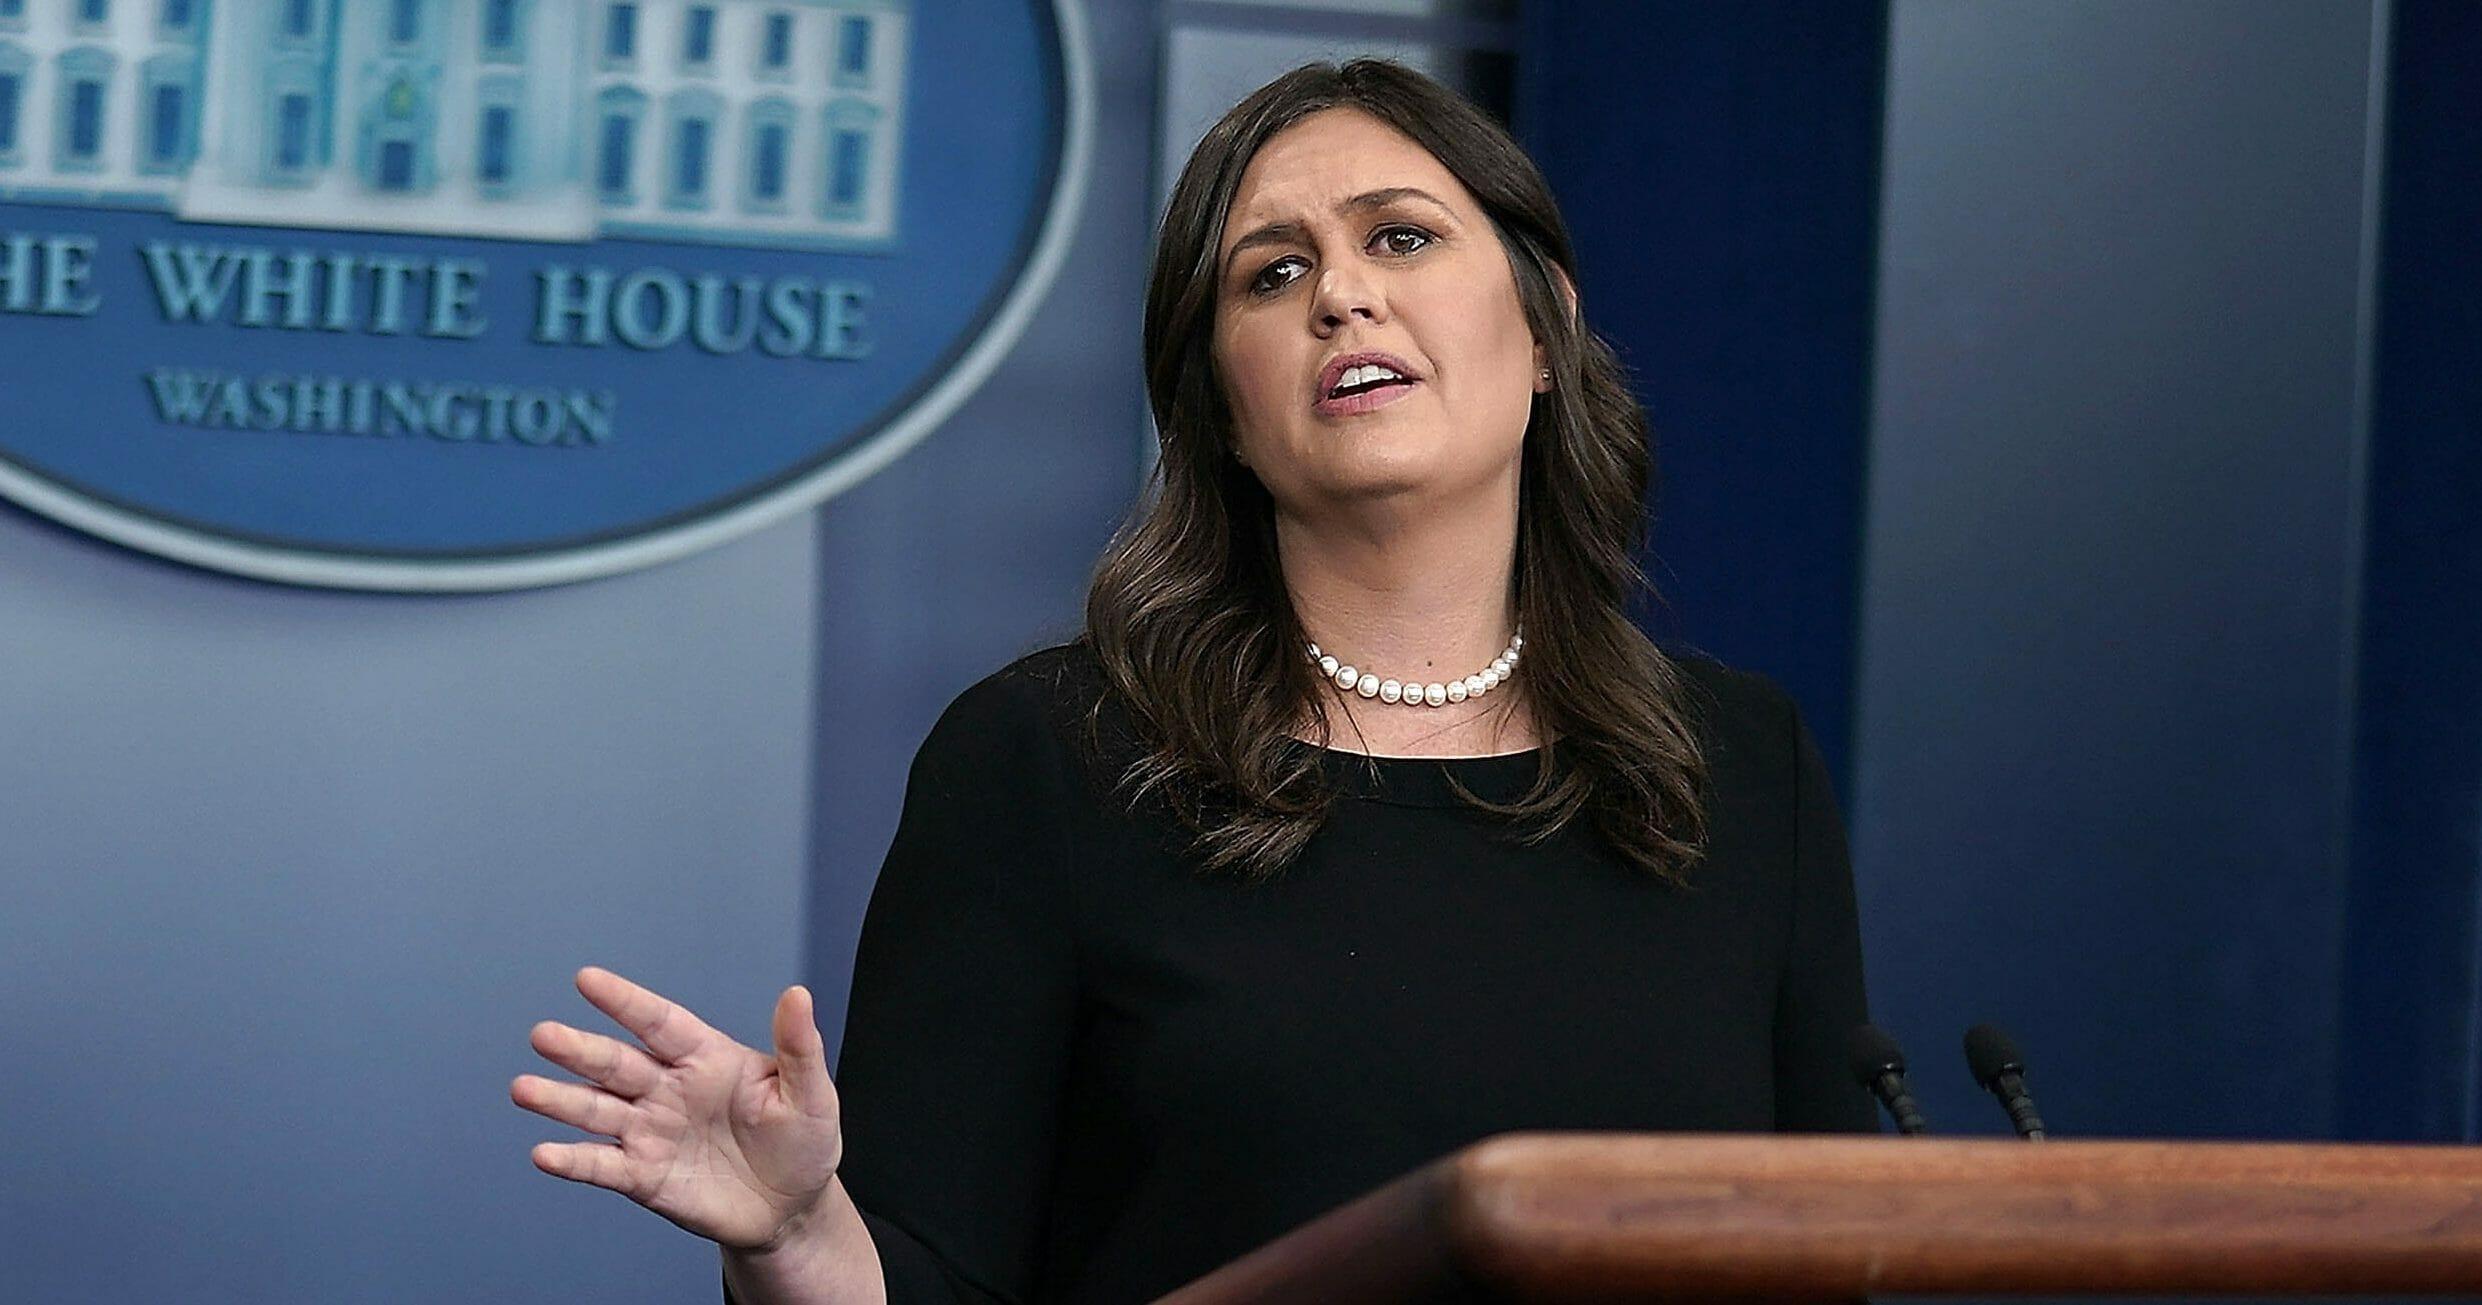 Press Secretary Sarah Sanders Holds Daily White House Briefing